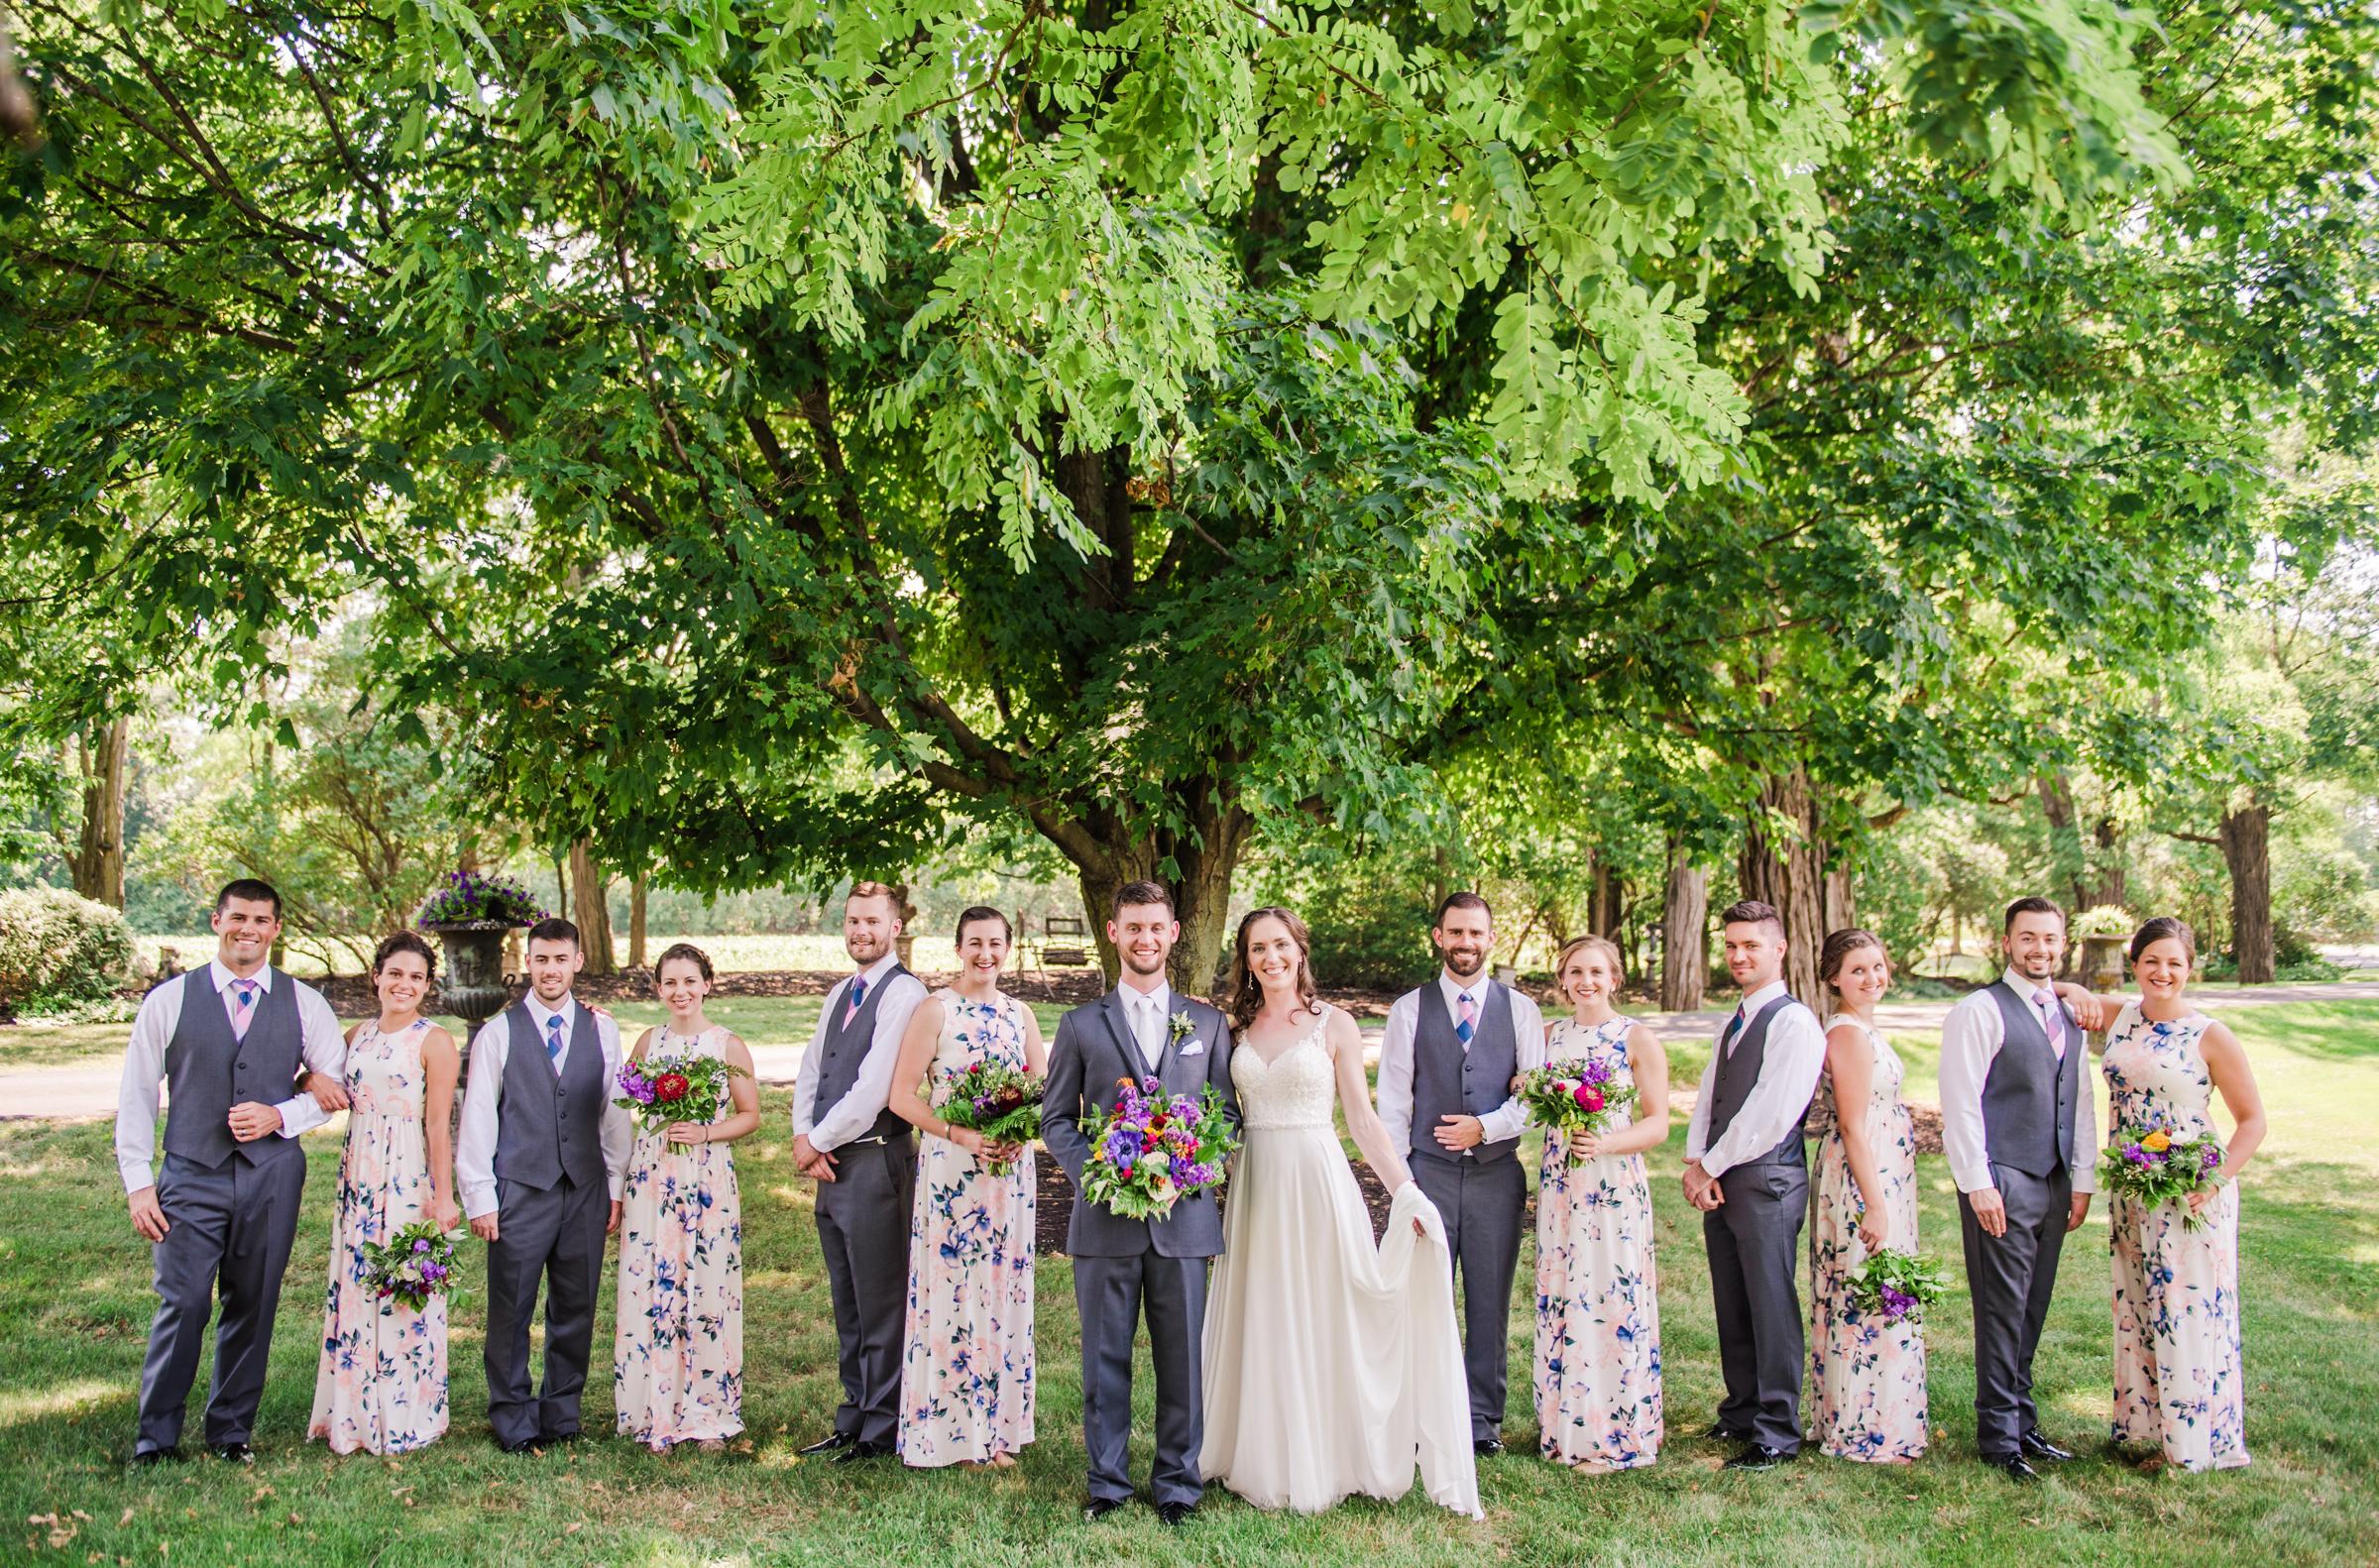 Jerris_Wadsworth_Wedding_Barn_Rochester_Wedding_JILL_STUDIO_Rochester_NY_Photographer_DSC_2394.jpg